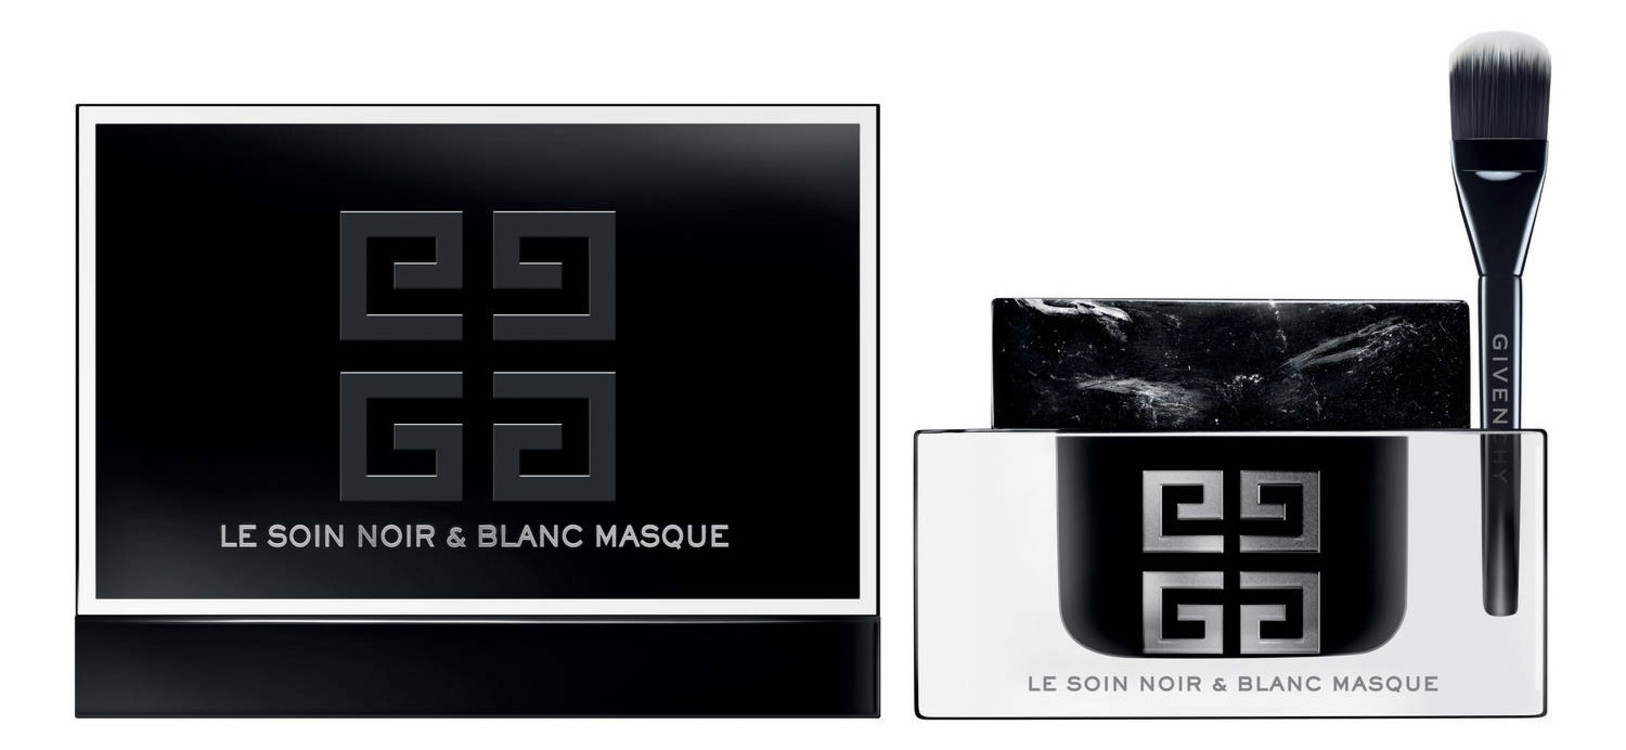 Маска с мраморной текстурой Le Soin Noir & Blanc Masque, Givenchy